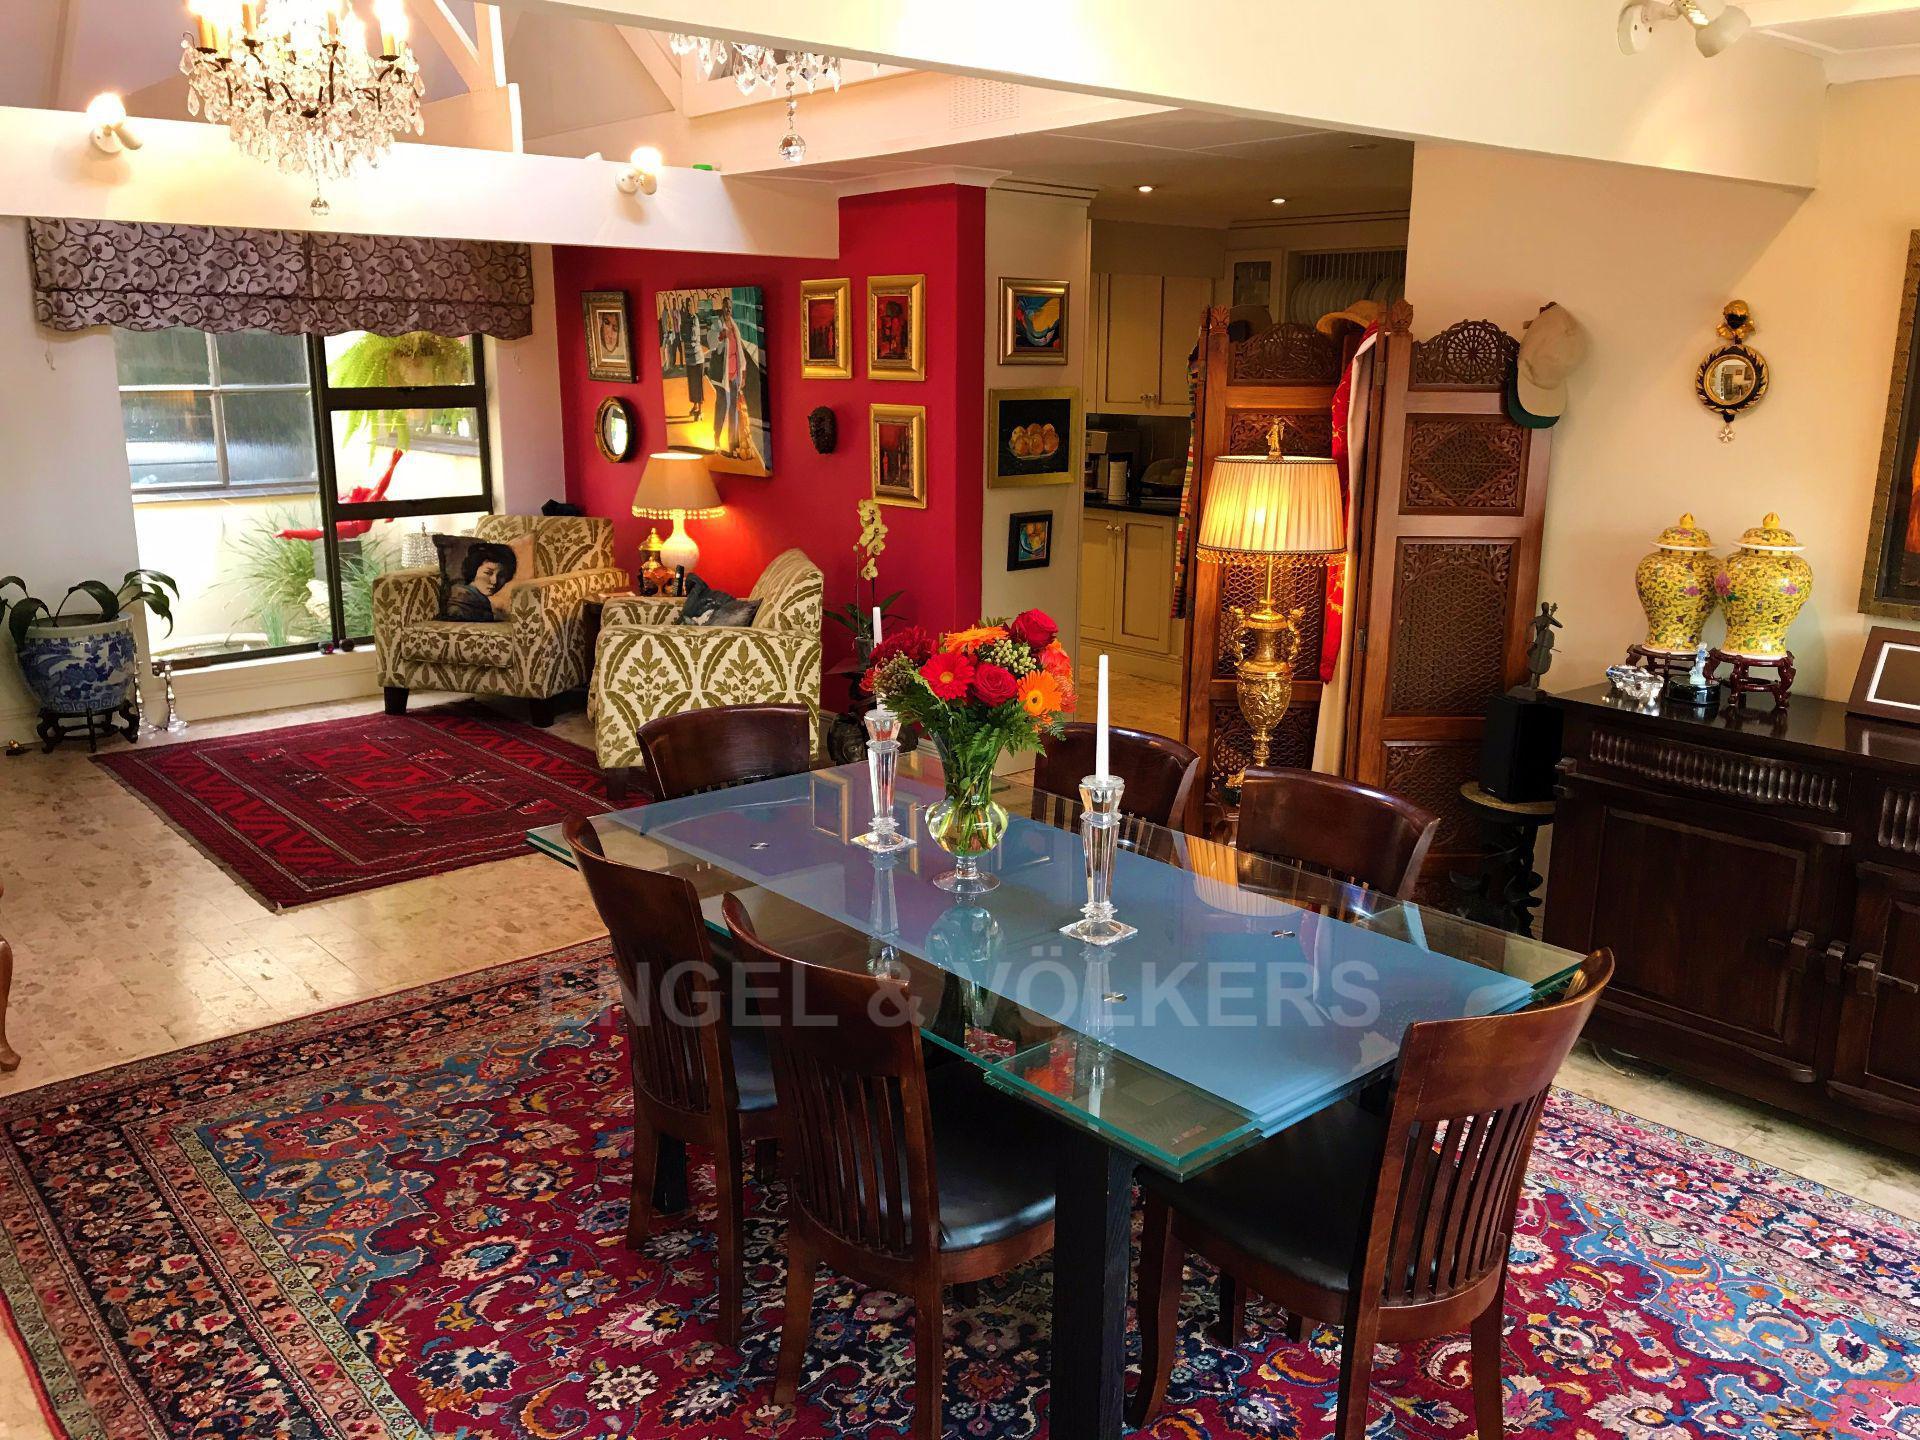 Heilige Akker property for sale. Ref No: 13555391. Picture no 5